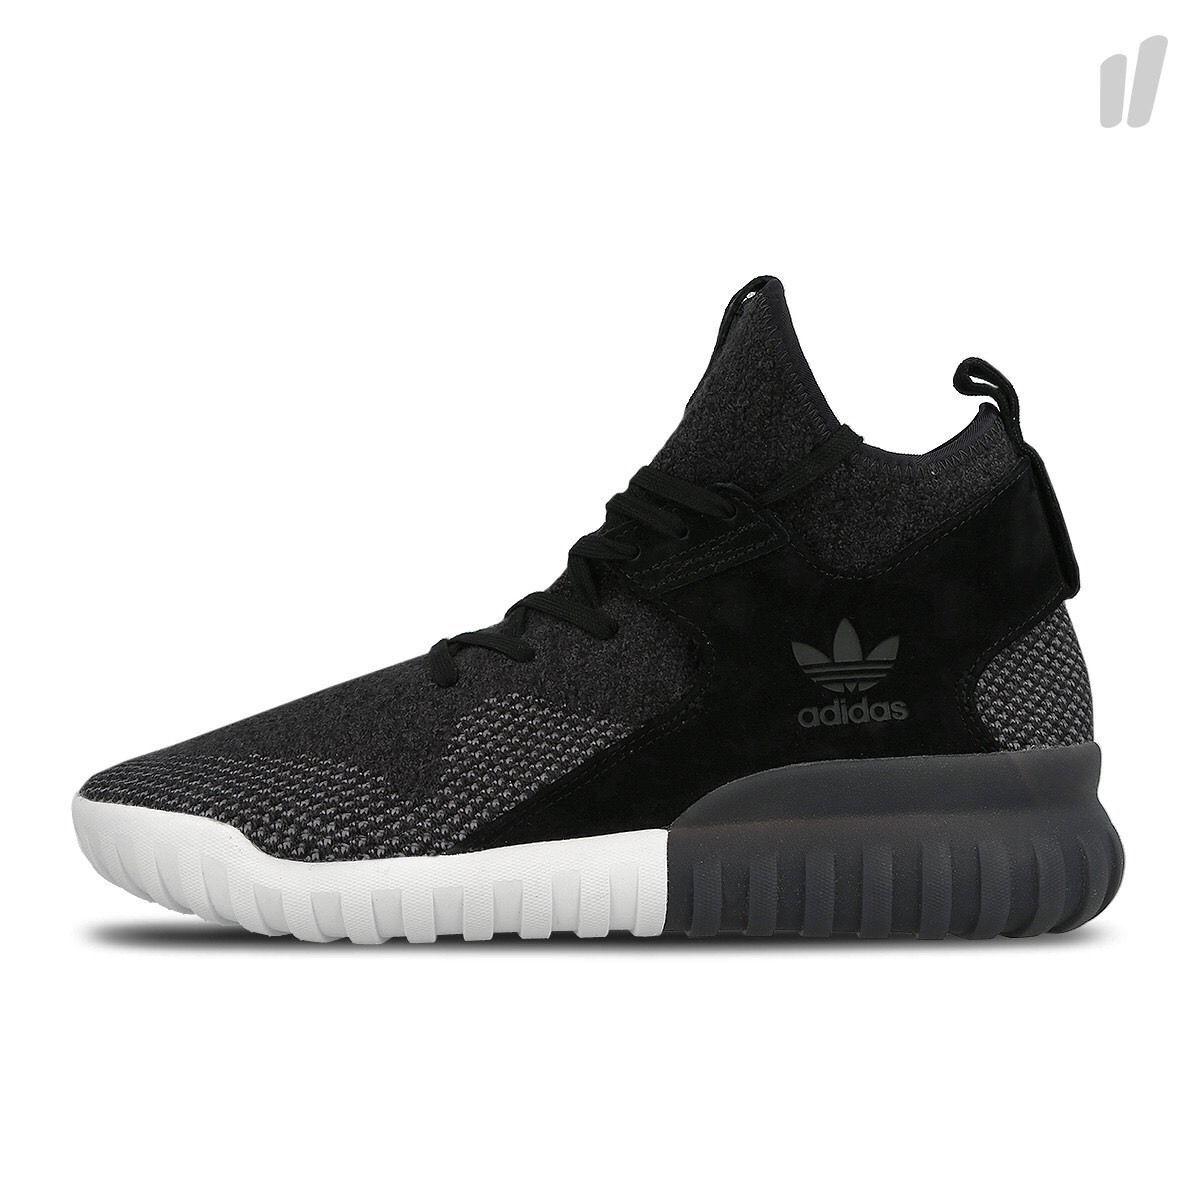 Adidas originali originali Adidas tubulare x pk scarpe da uomo taglia 10,5 nero grigio bianco bb2379 nuova c98b3b